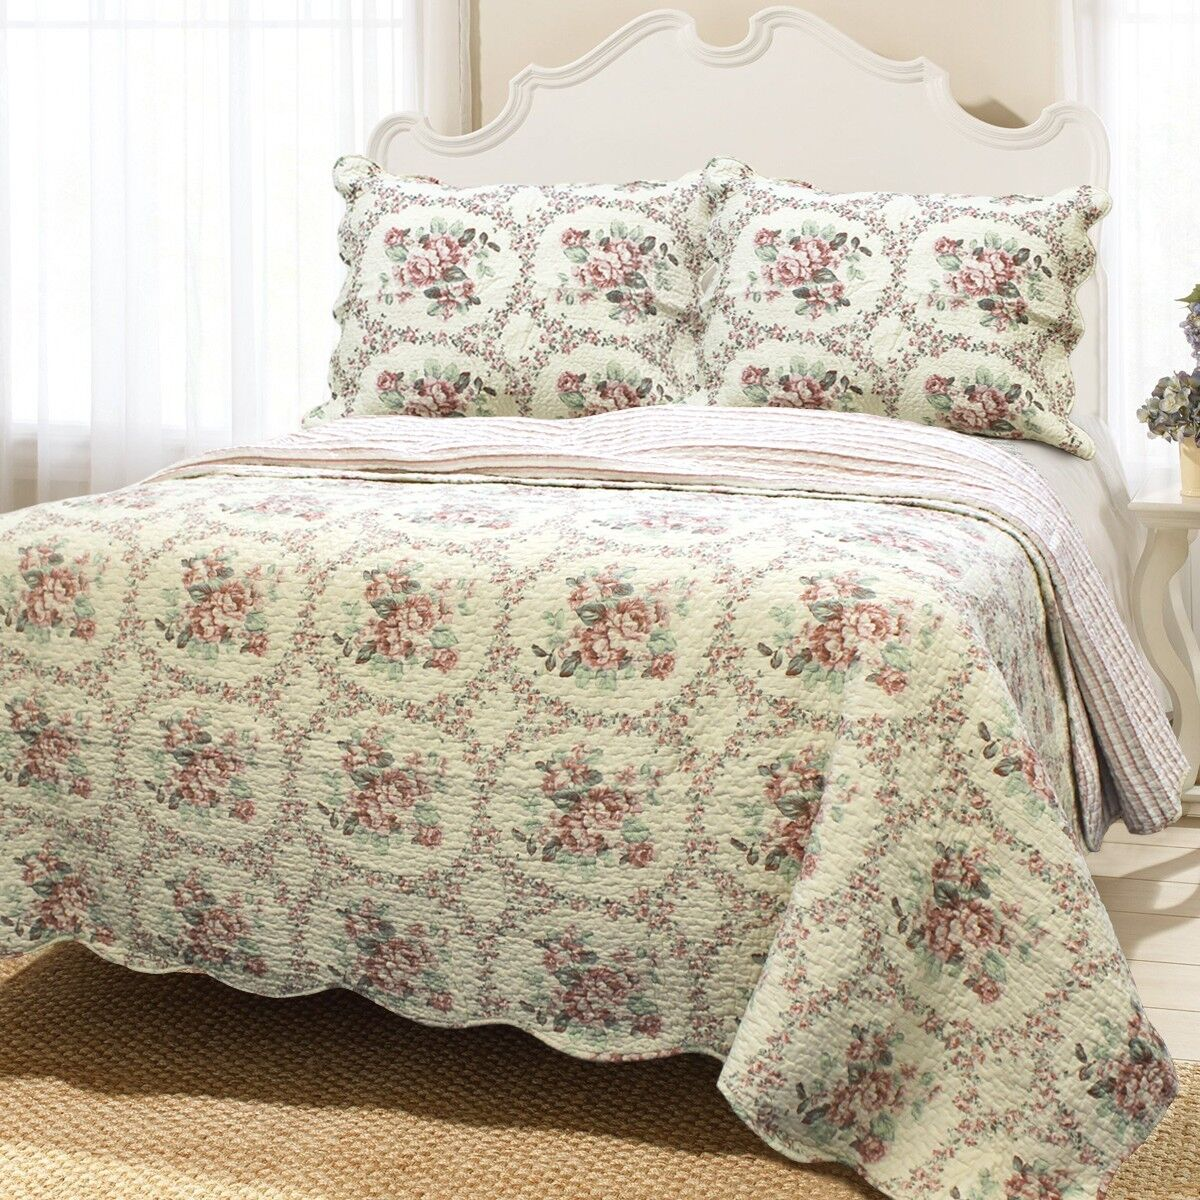 Reminiscent Mood rot 3-Piece Cotton Quilt Set, Bedspread, Coverlet